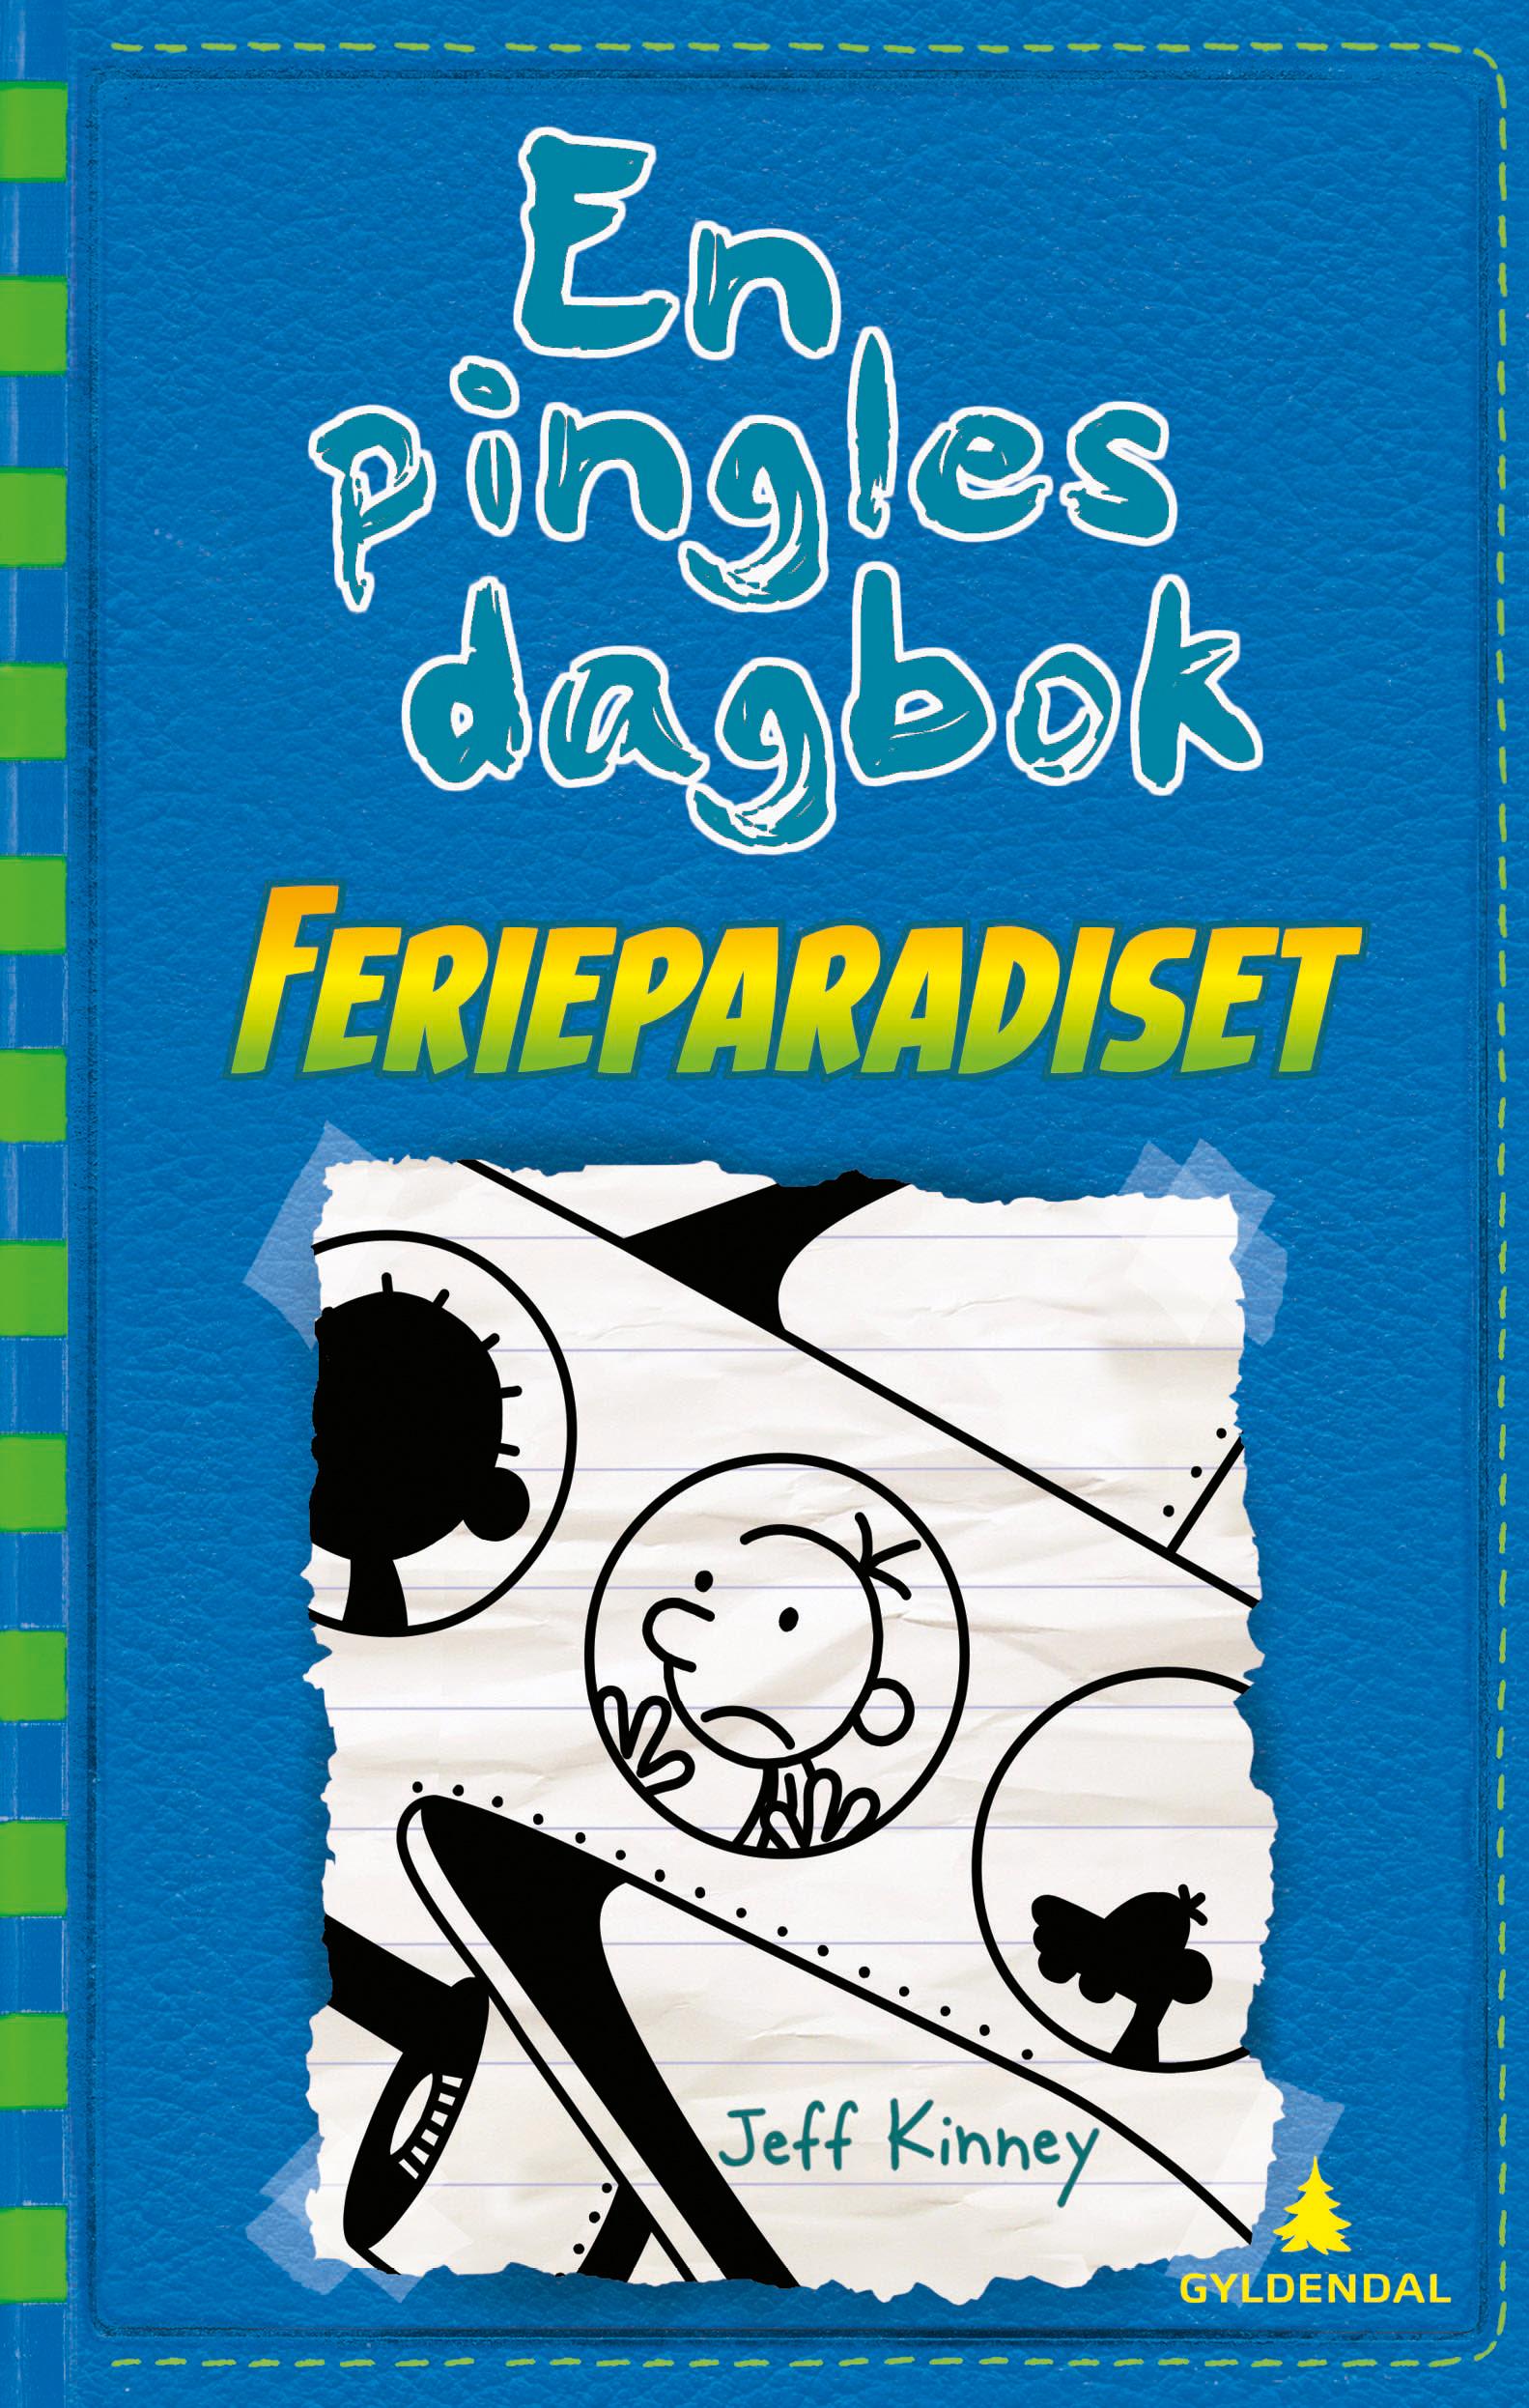 en pingles dagbok 11